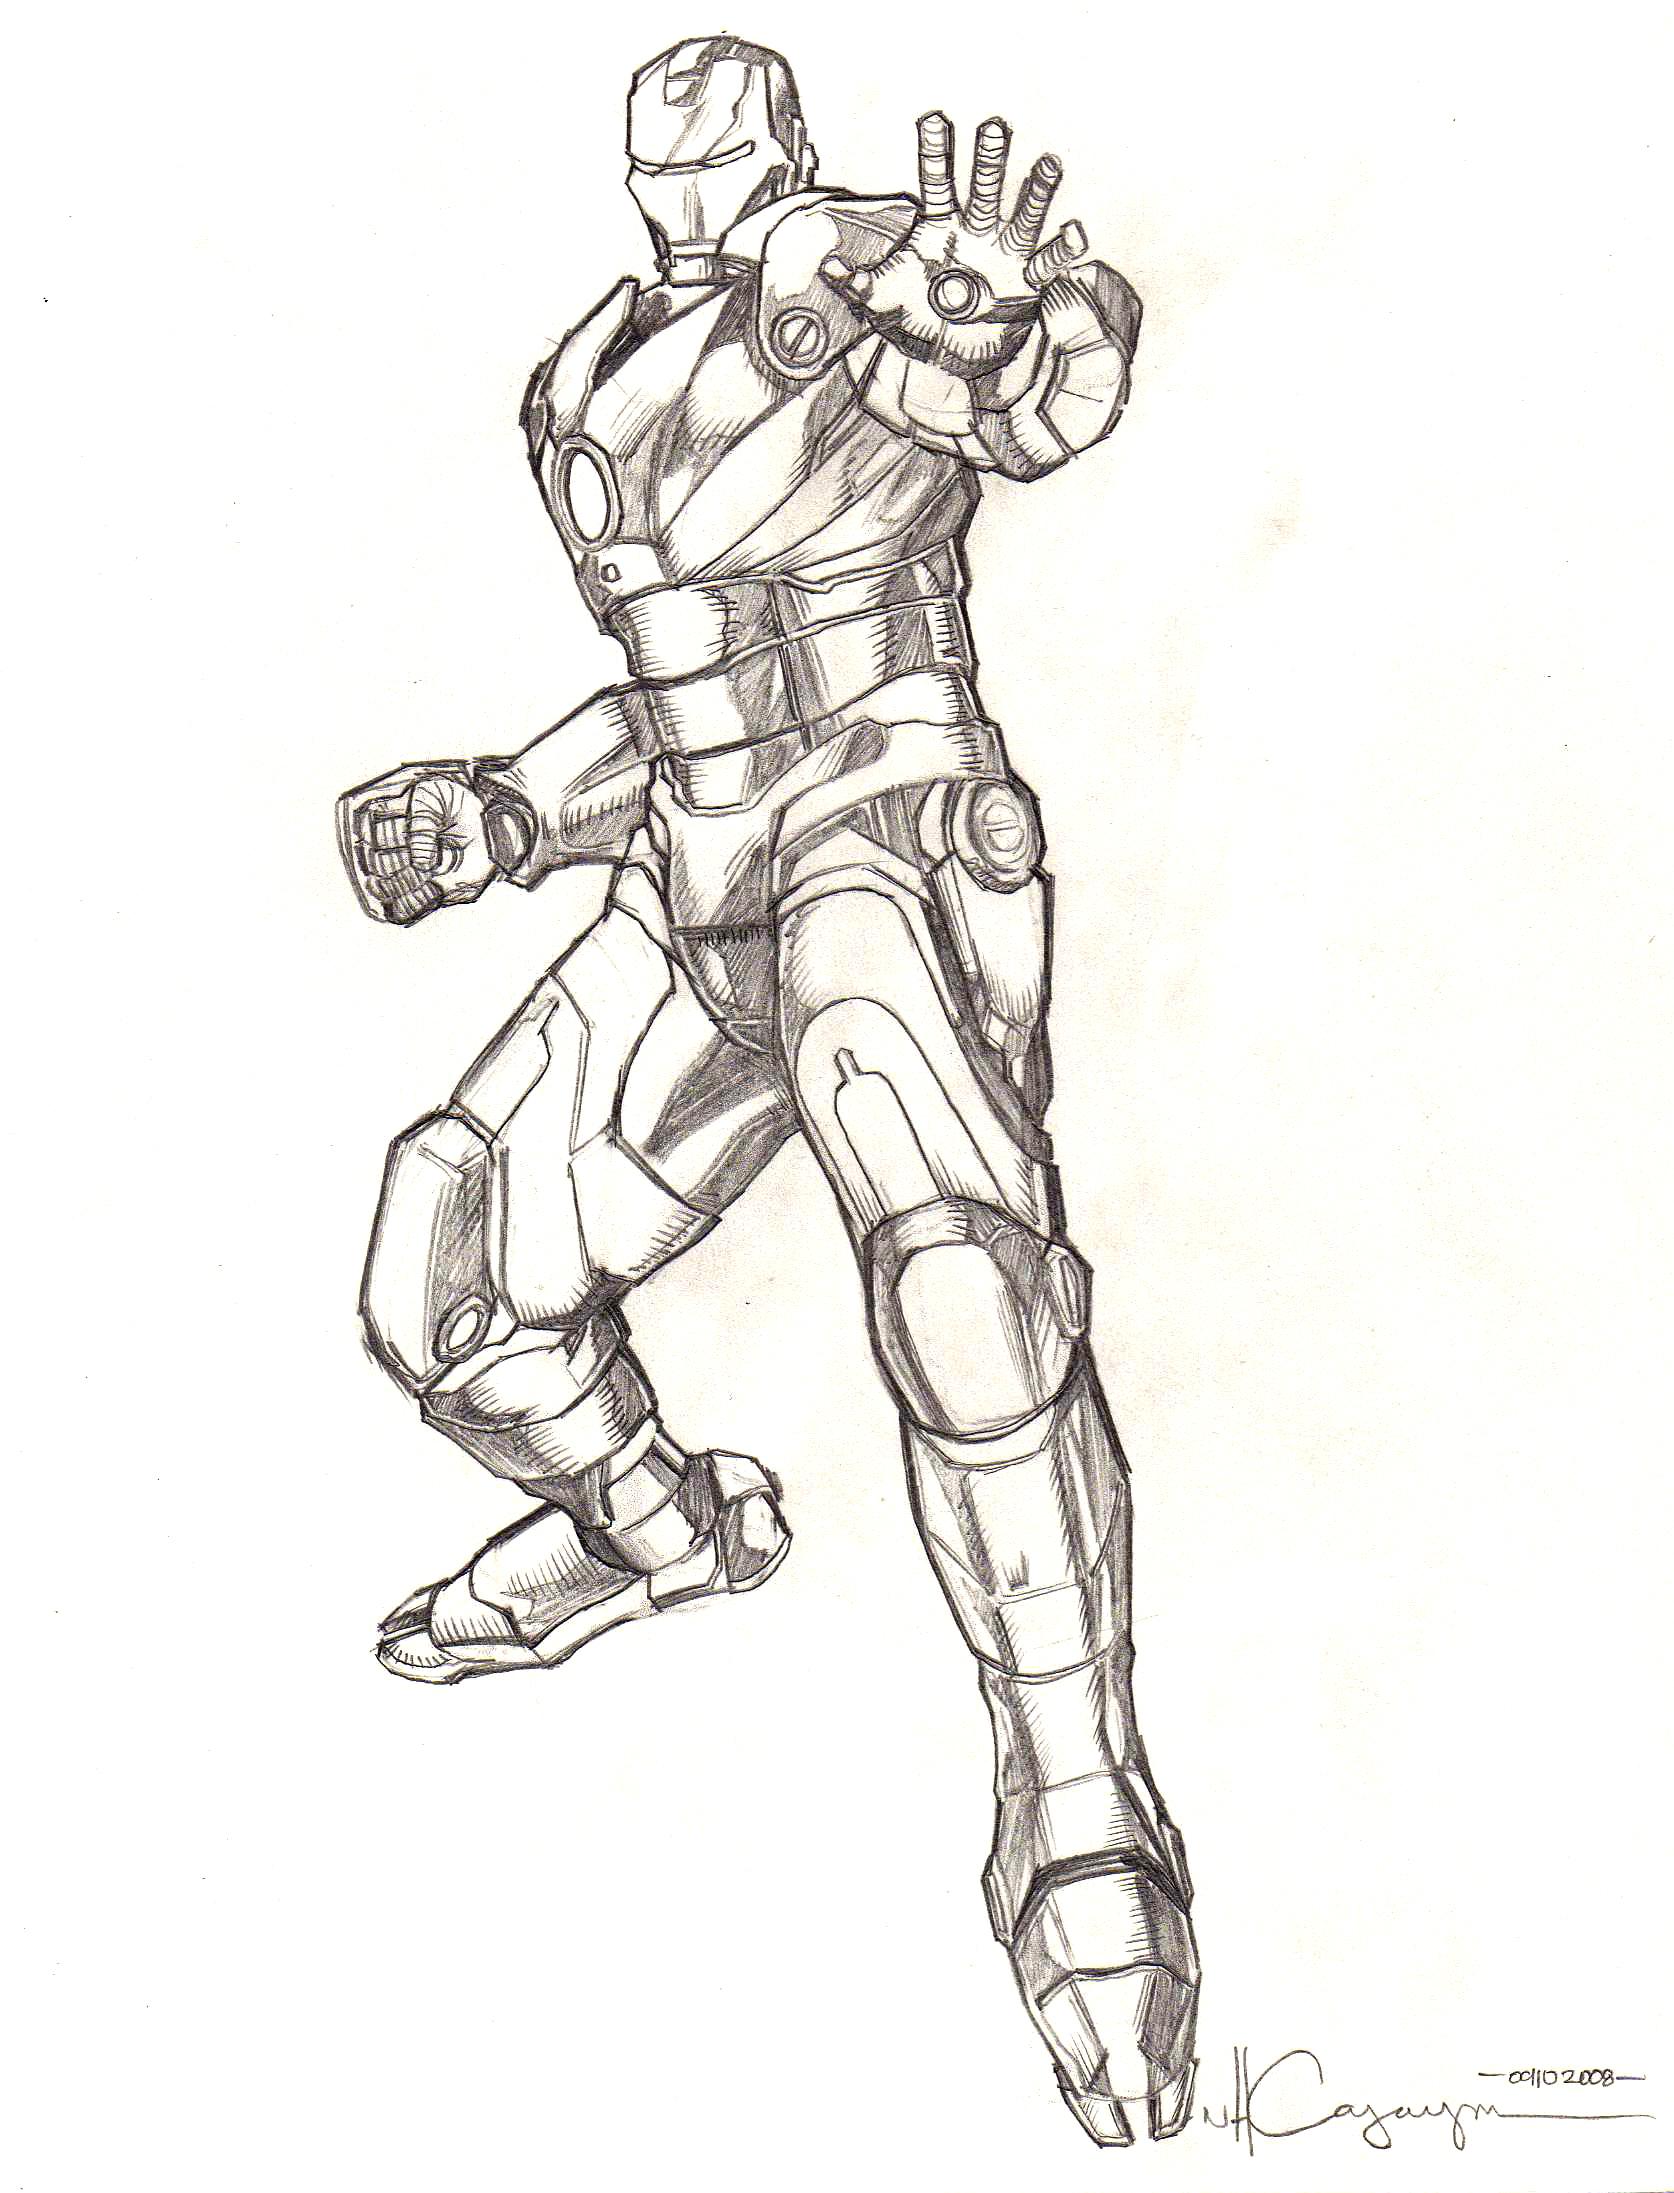 1674x2193 Iron Man Pencil Drawing Images Hd Iron Man Mark 3 Pencil 1 By